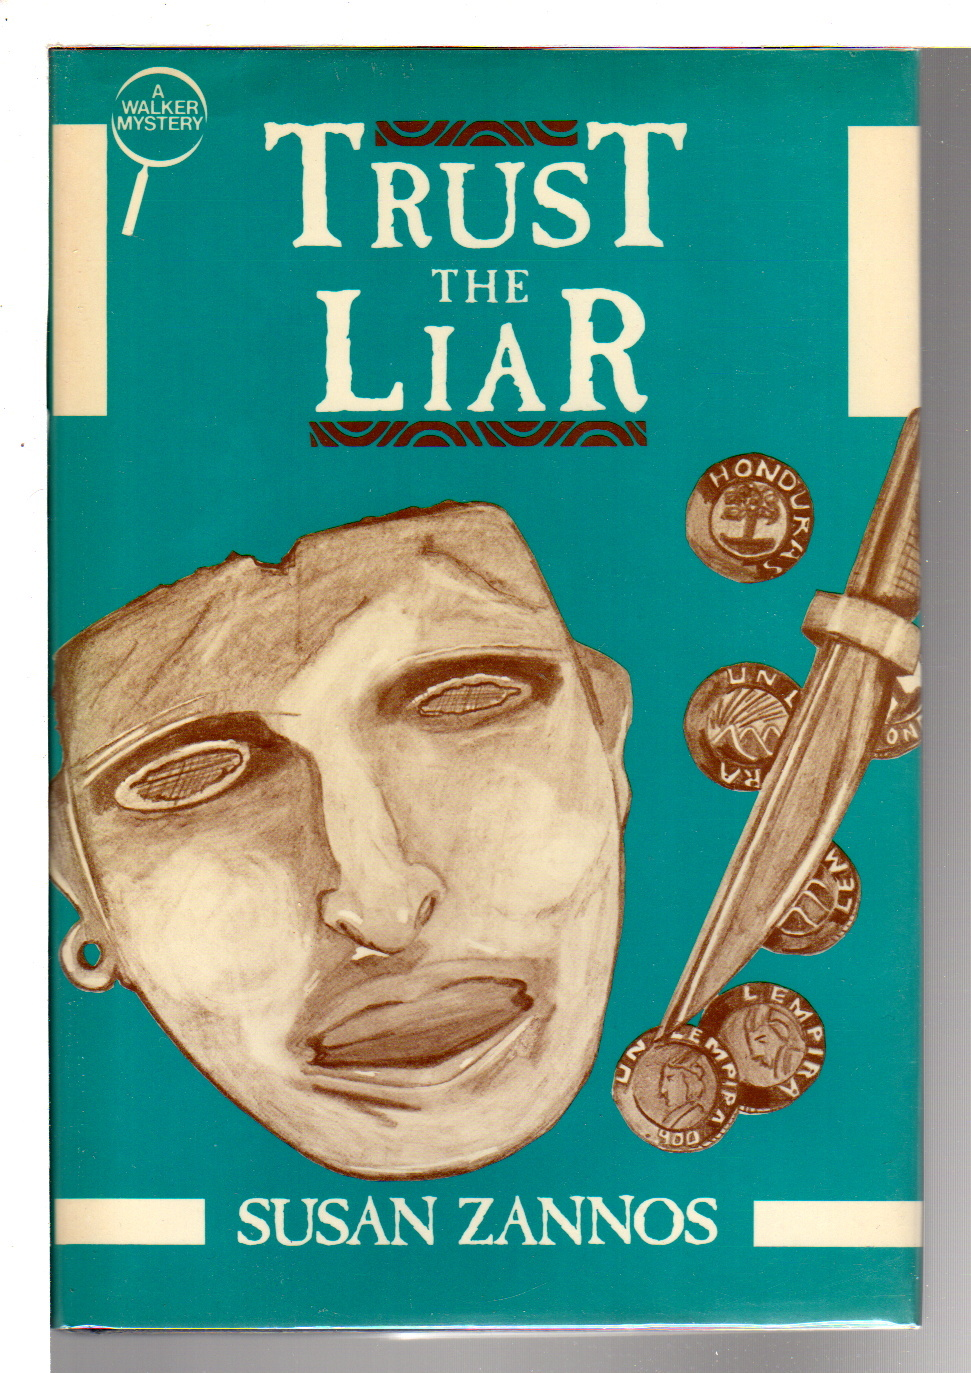 ZANNOS, SUSAN. - TRUST THE LIAR.